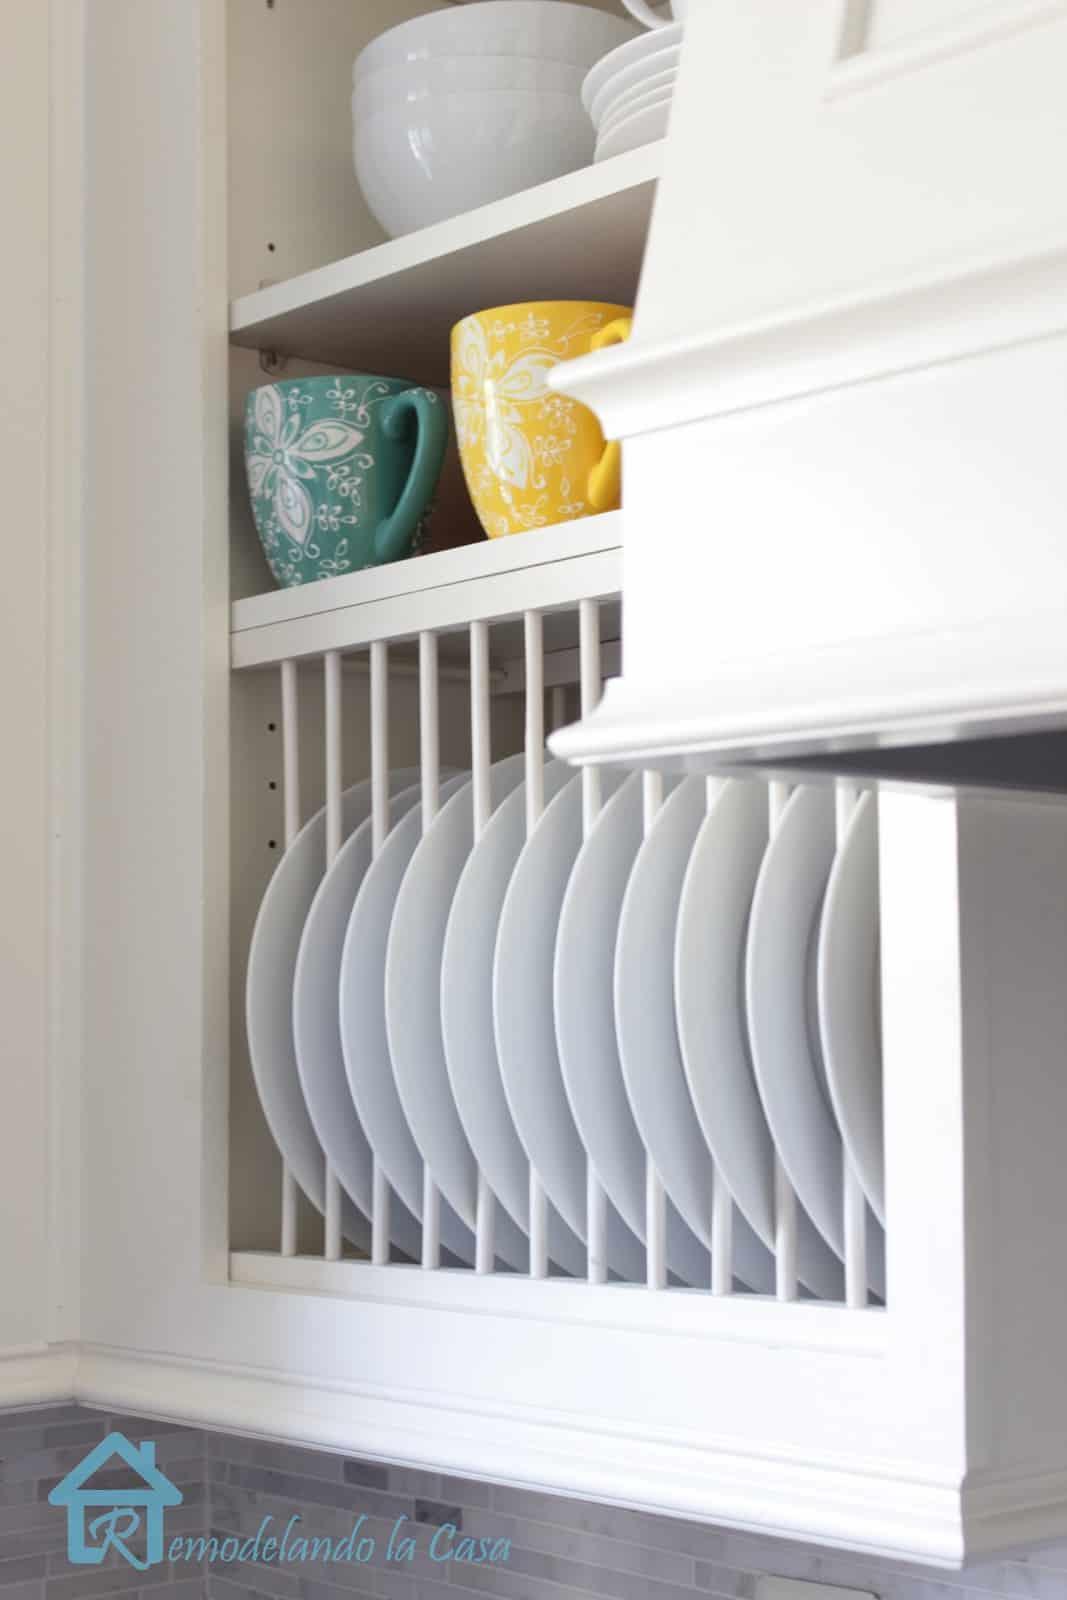 Inside cabinet plate rack